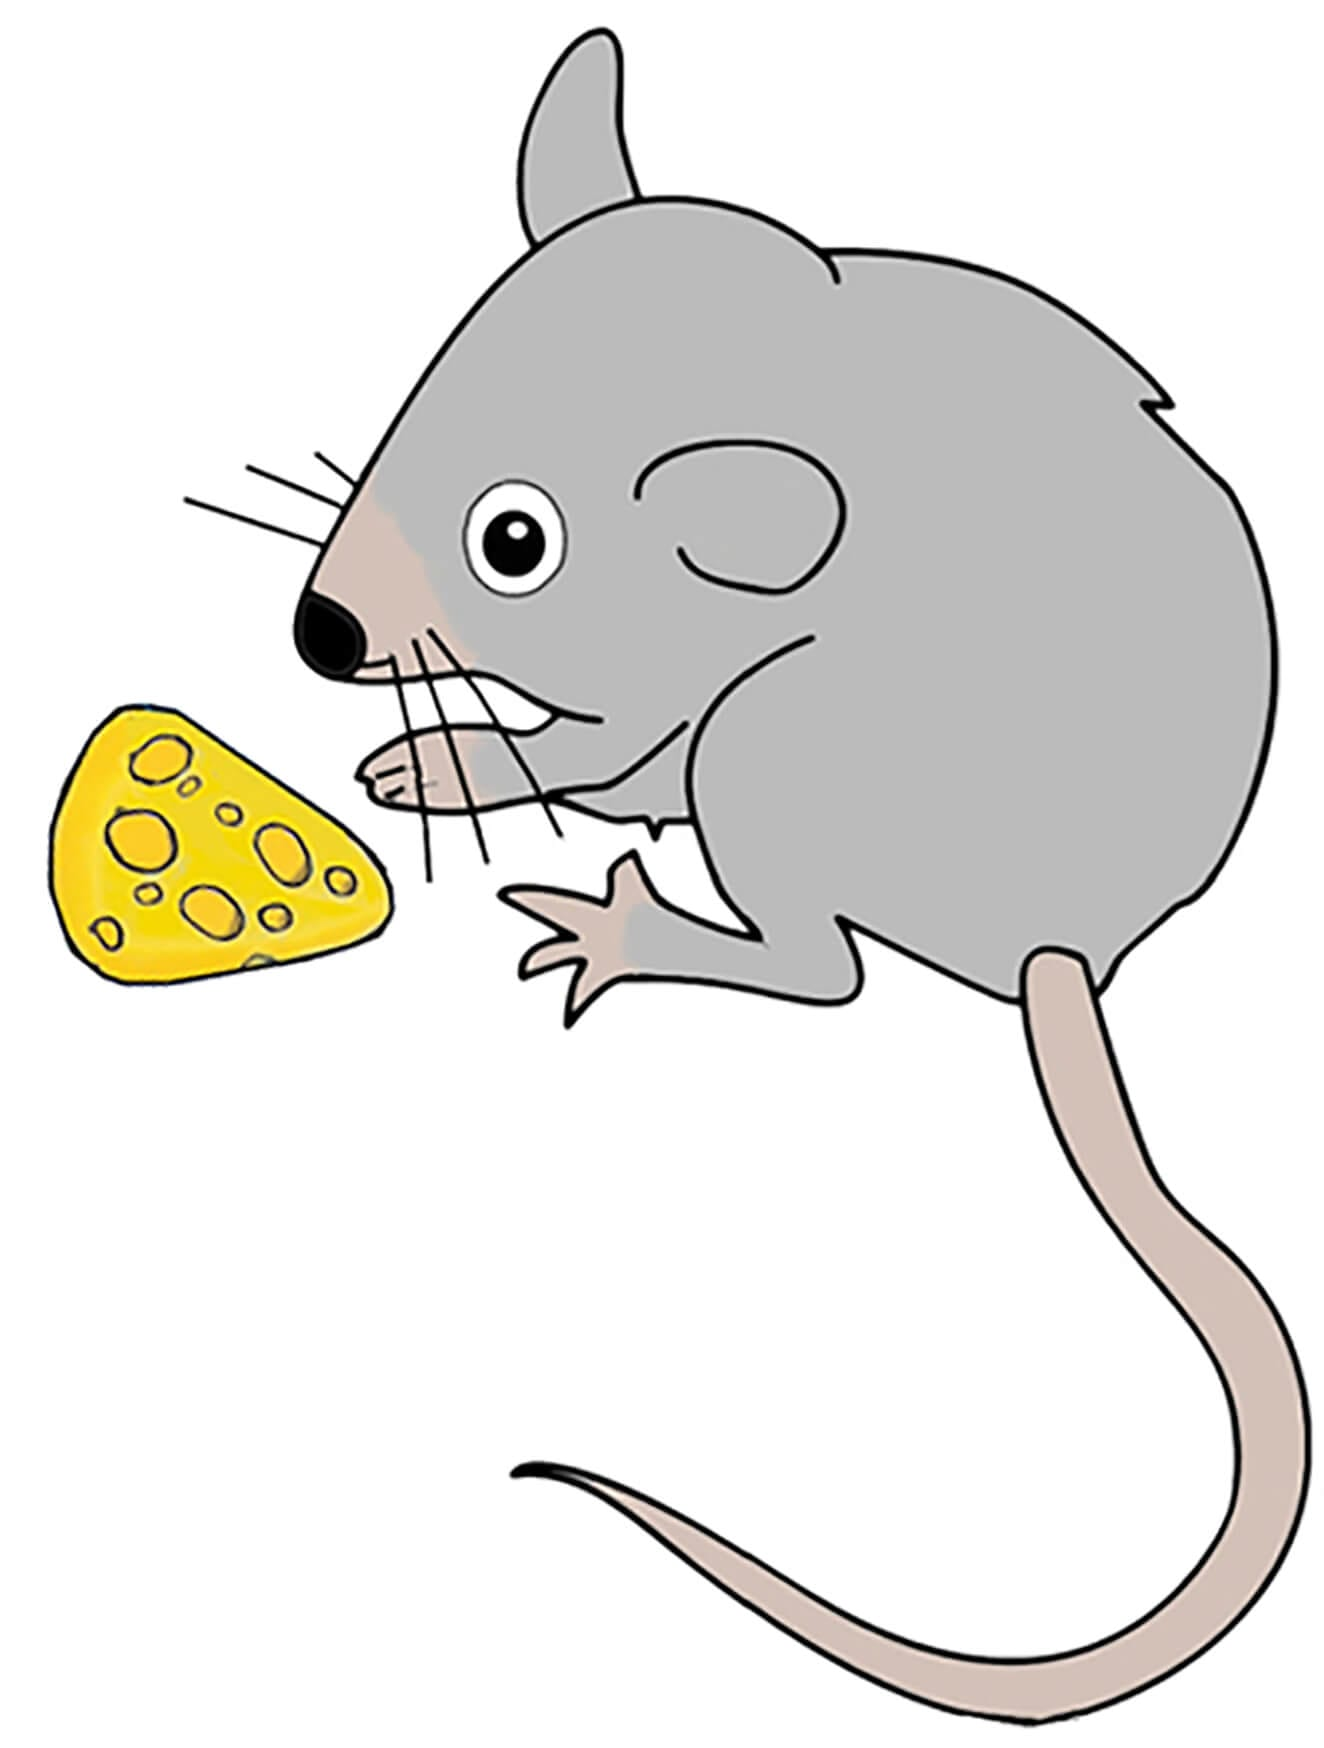 Мышка с сыром картинка 2